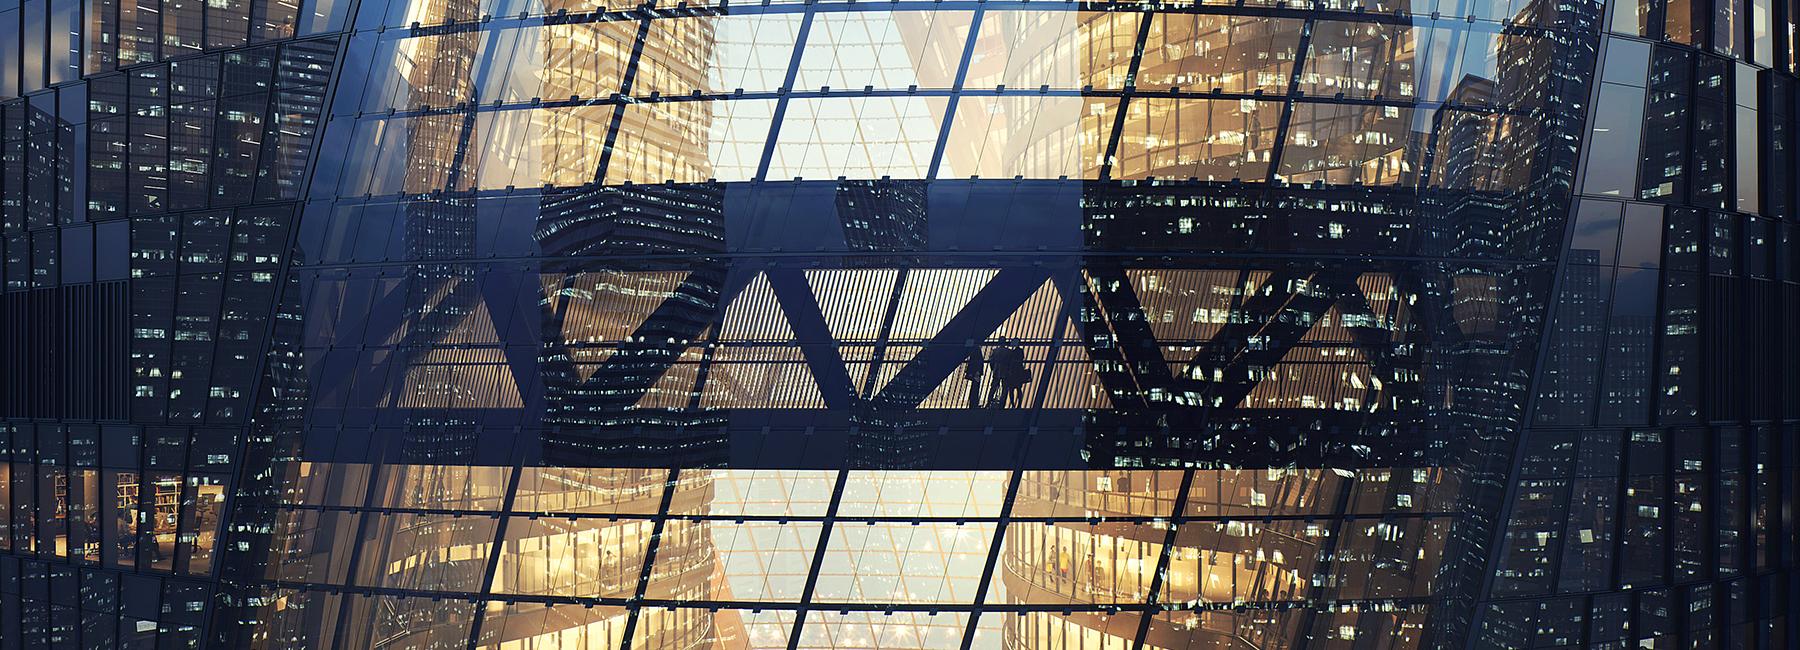 zaha-hadid-architects-leeza-soho-building-beijing-designboom-011.jpg